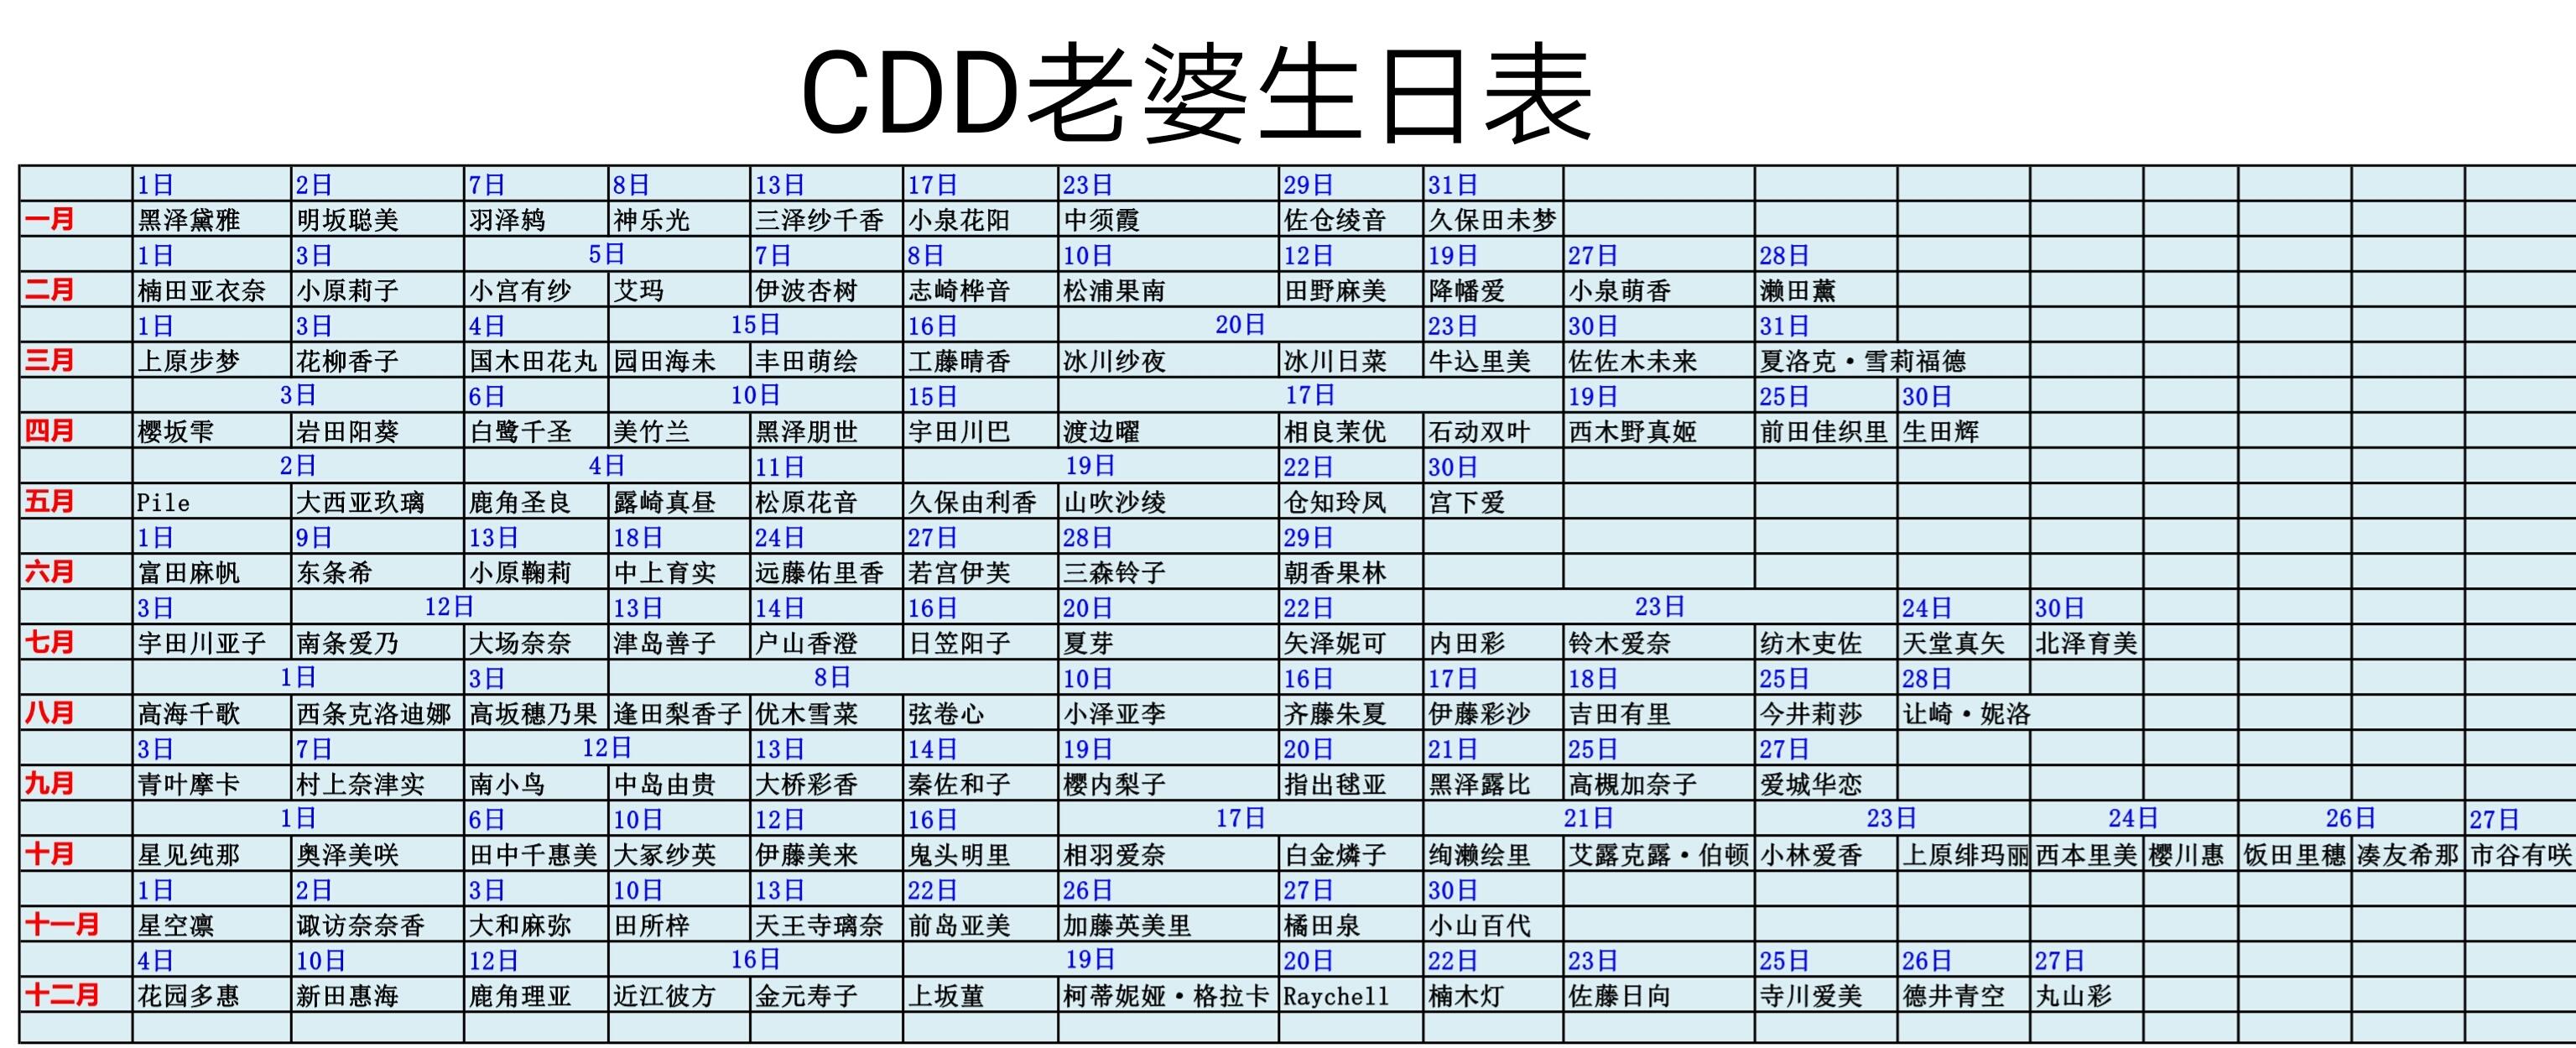 CDD老婆生日表